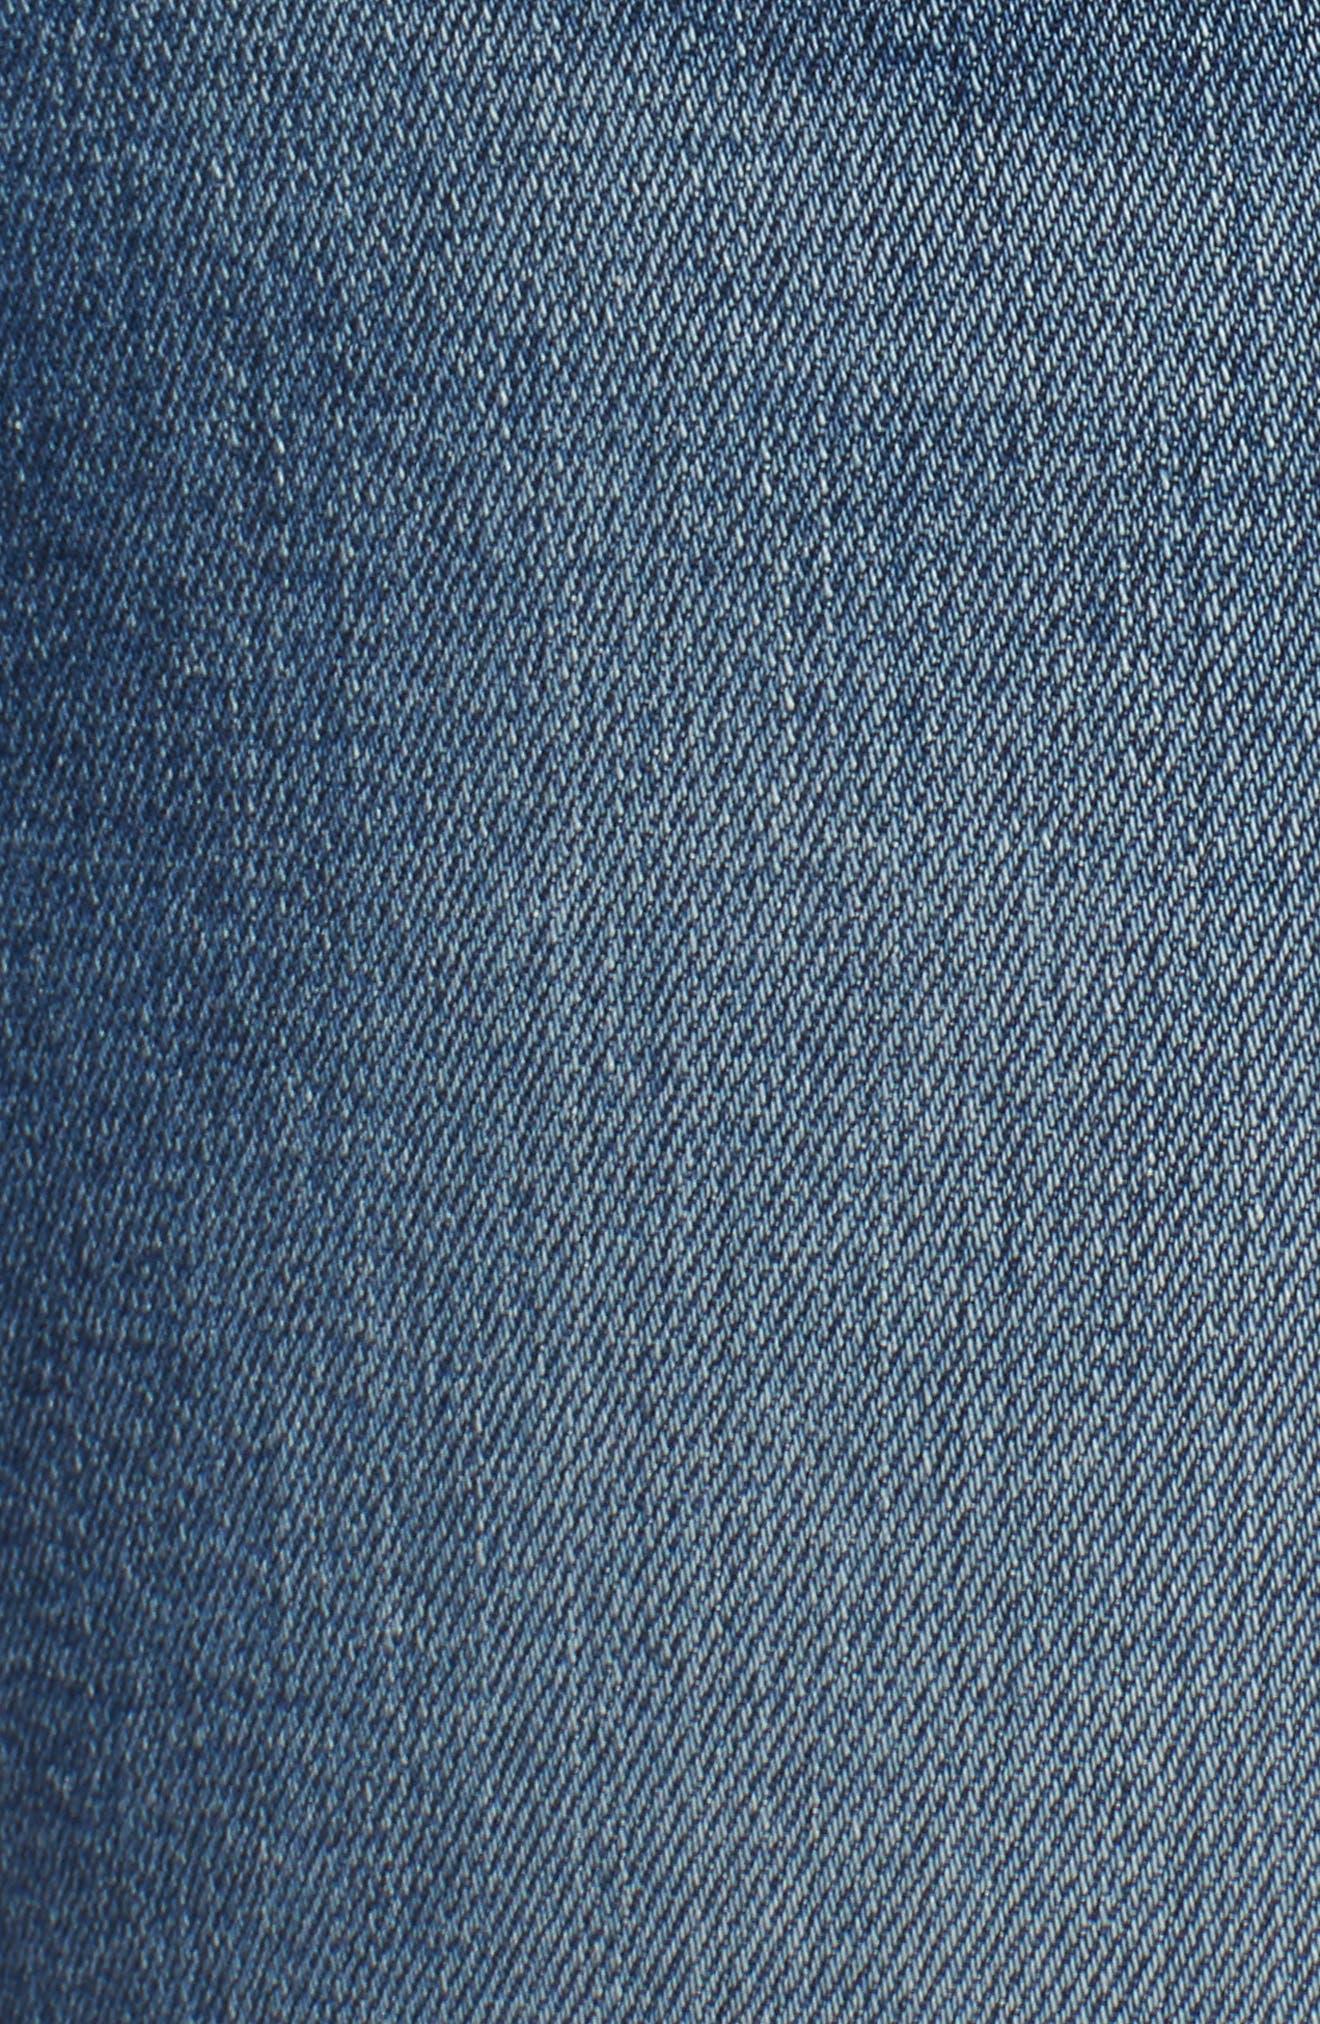 Cuffed Bermuda Denim Shorts,                             Alternate thumbnail 5, color,                             Lilac W/ Med Base